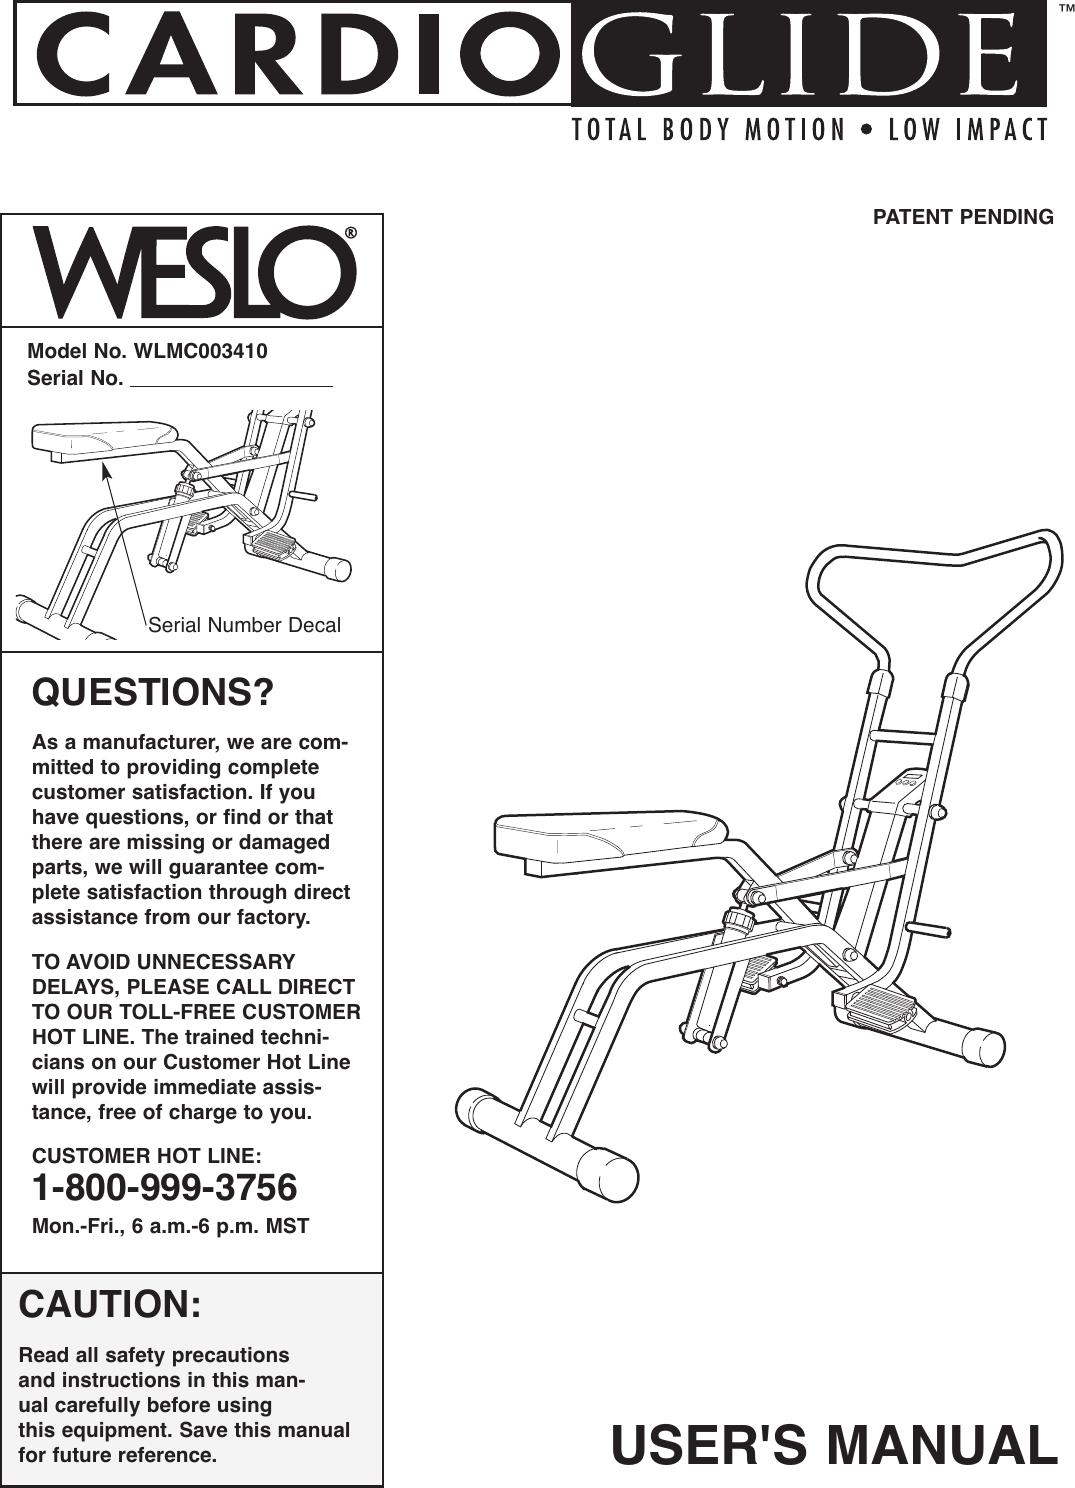 Weslo Wlmc003410 Owners Manual 285430